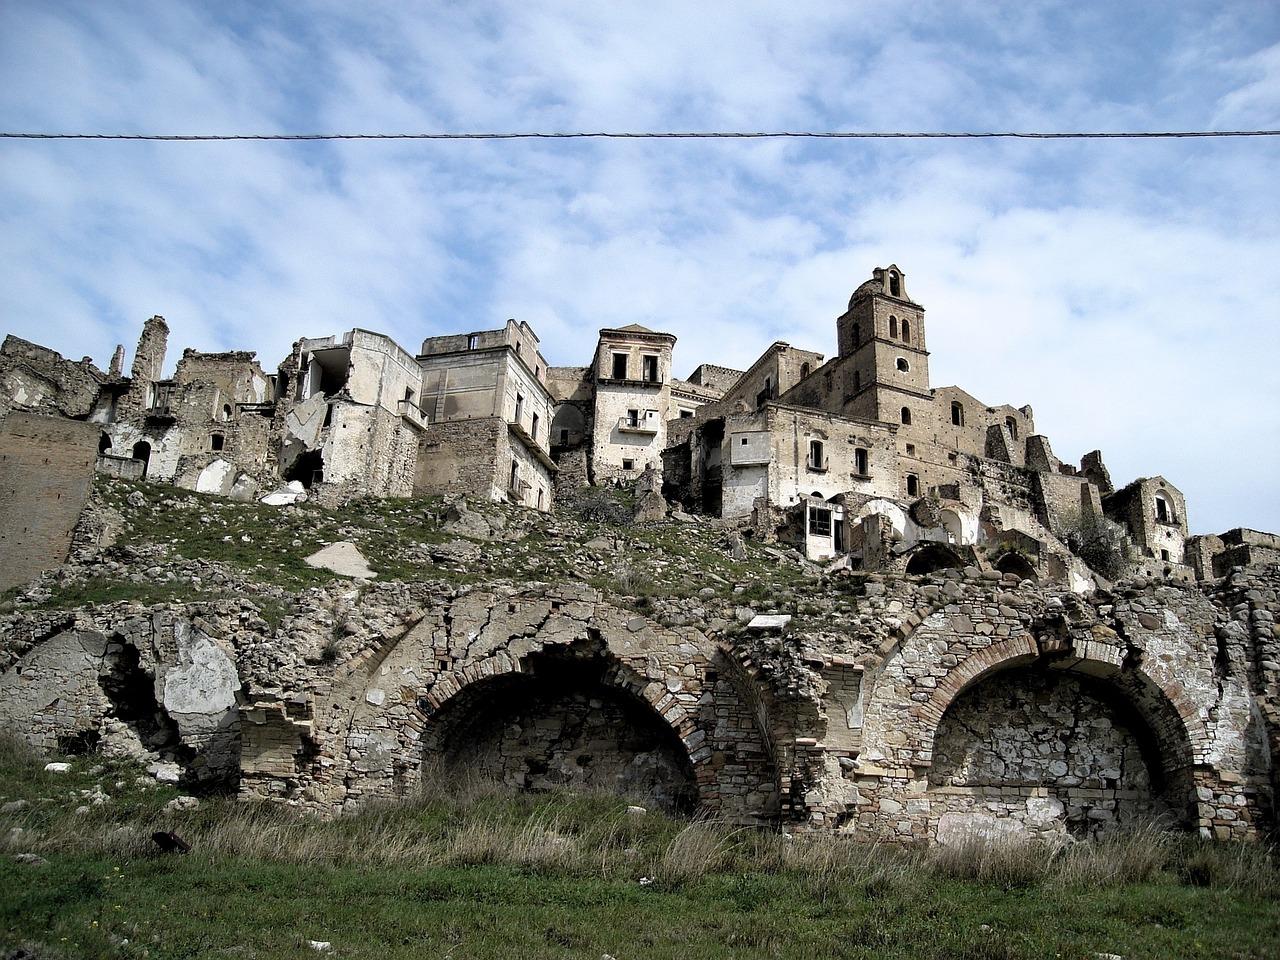 Craco Italia Tunawisma - Foto gratis di Pixabay